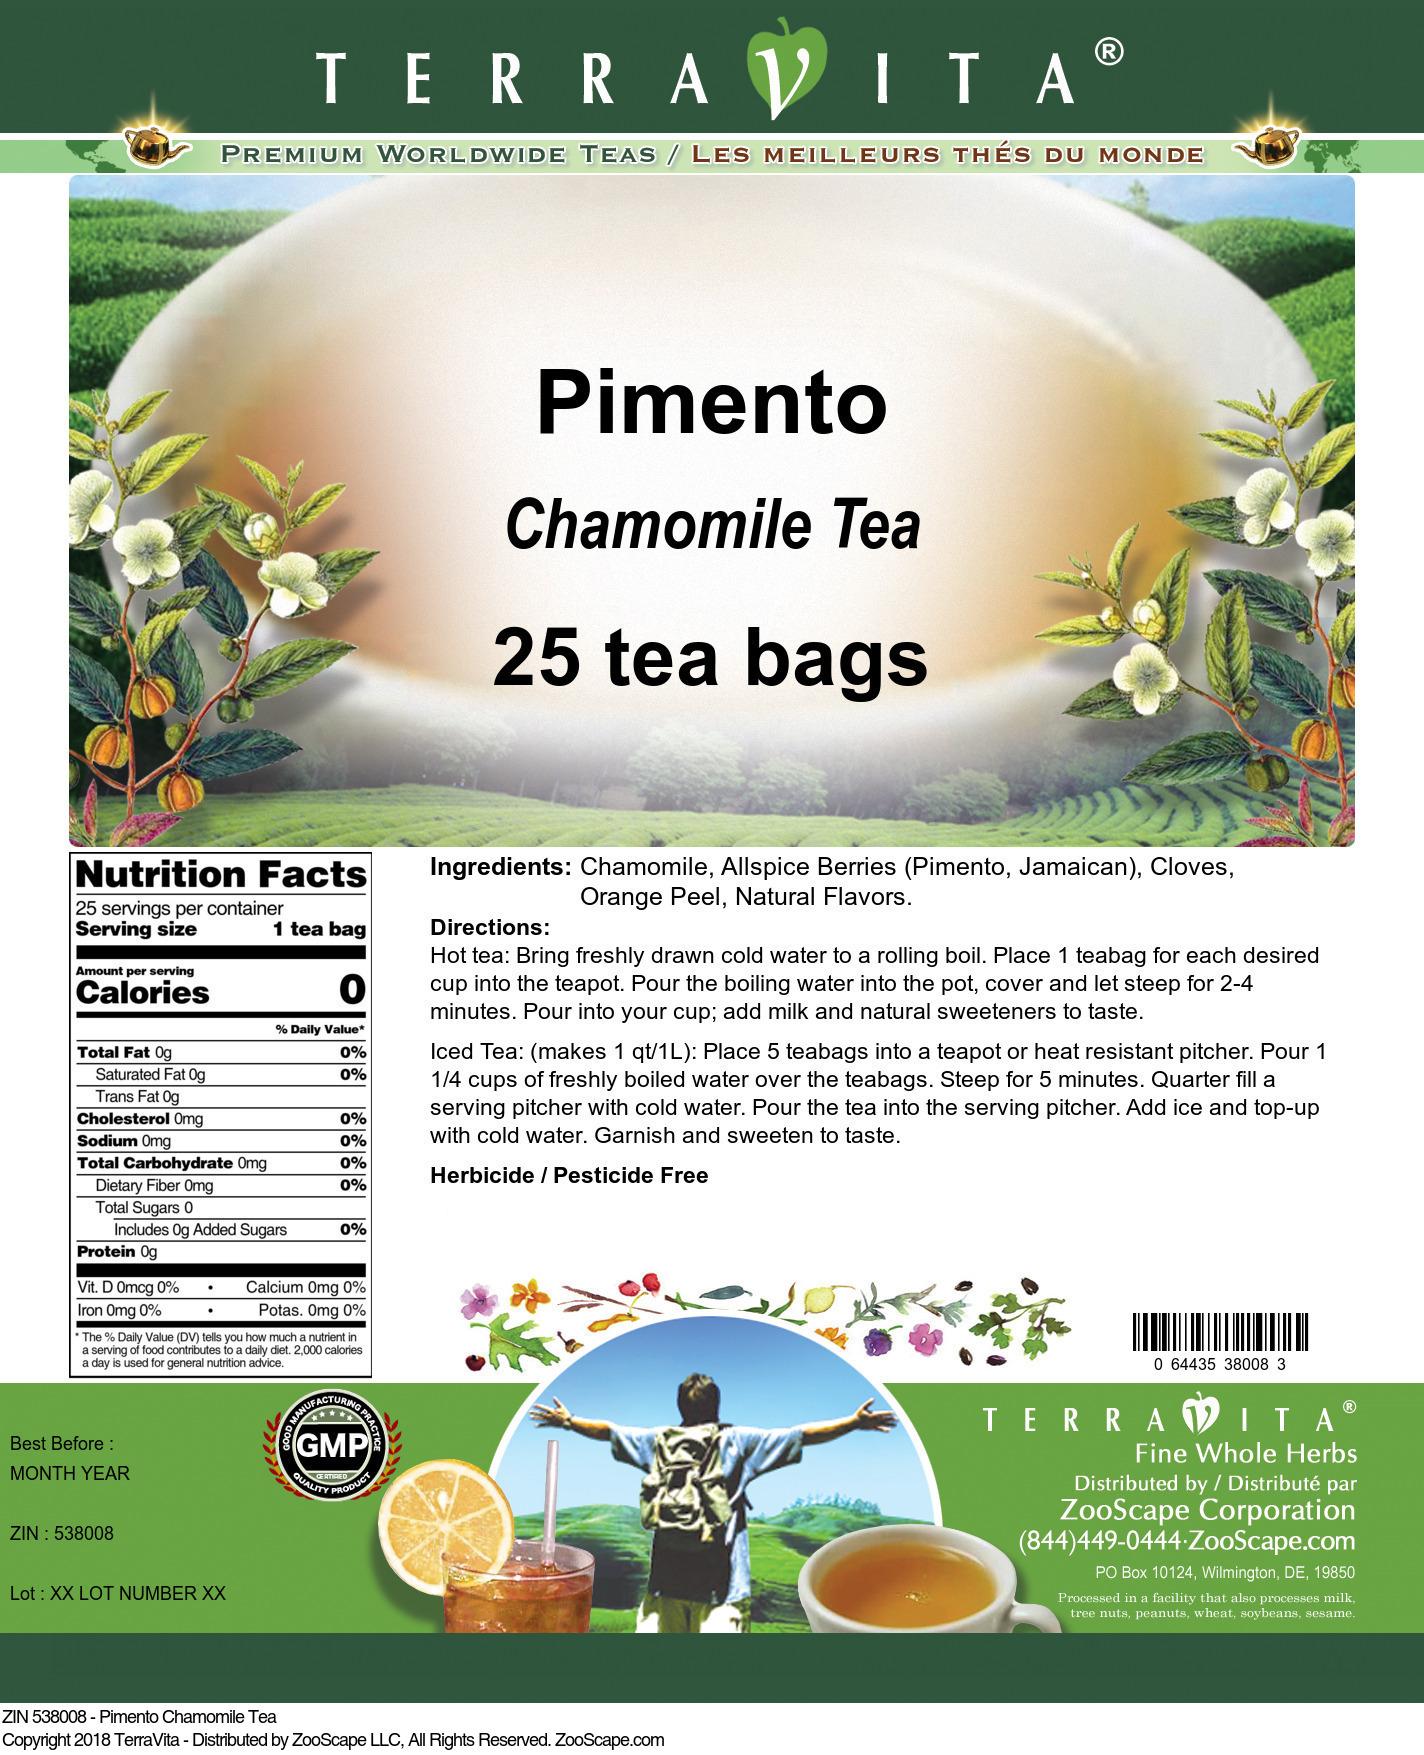 Pimento Chamomile Tea